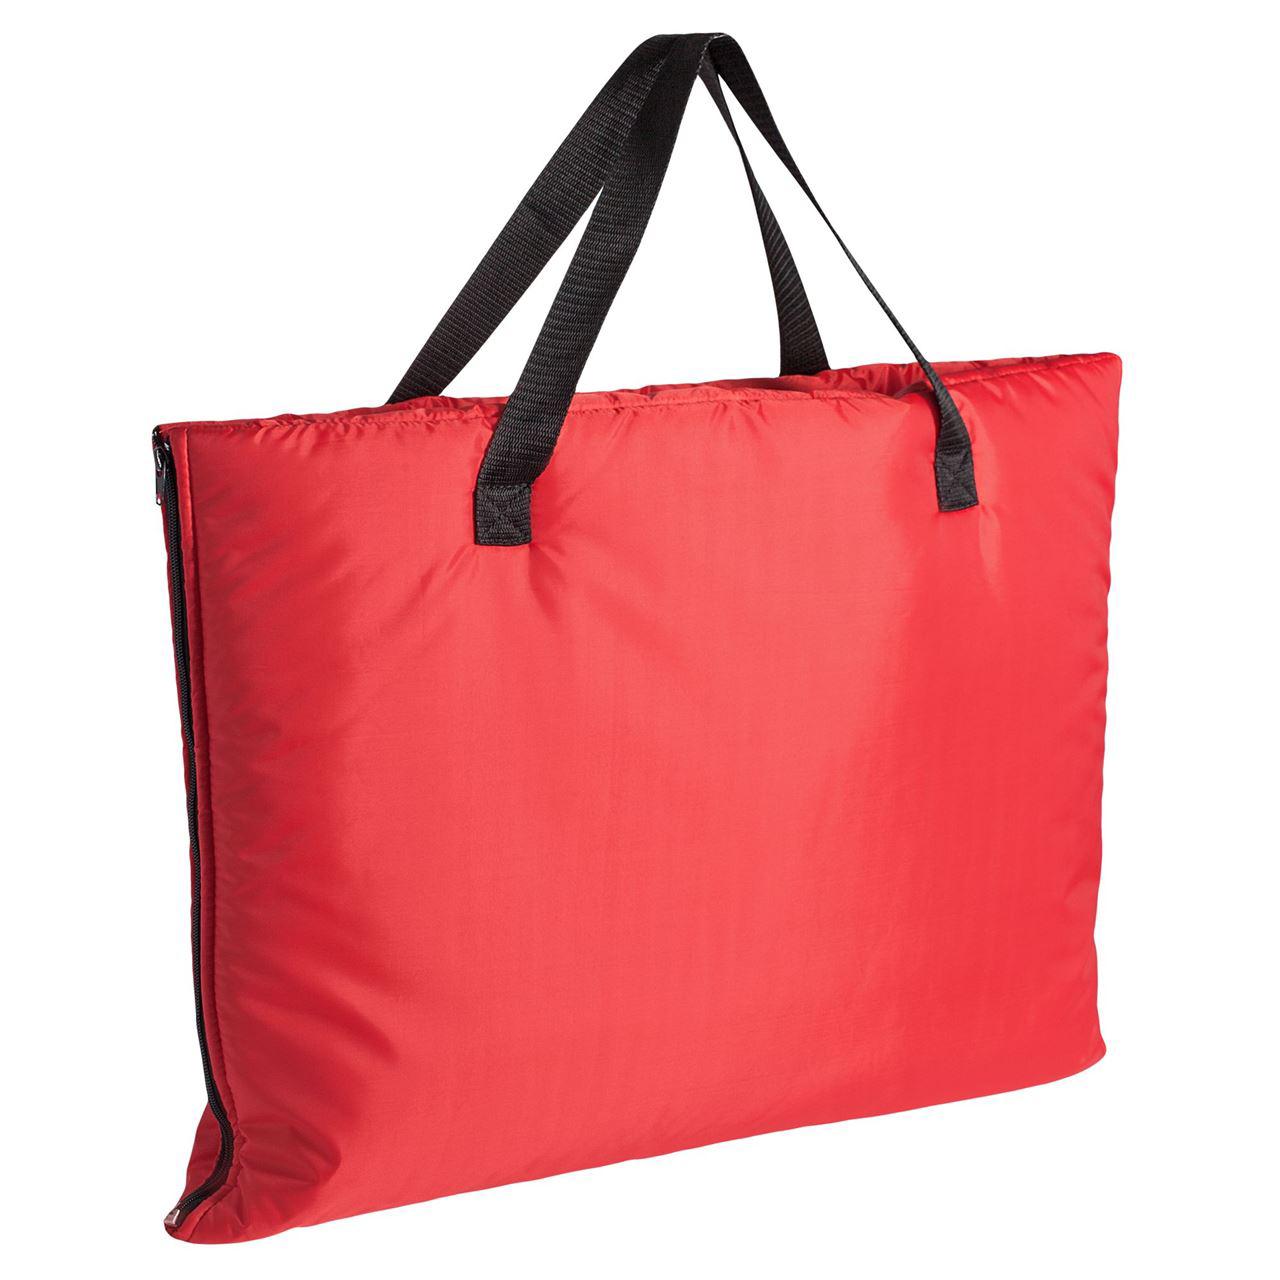 Пляжная сумка-трансформер Camper Bag, красная - 1